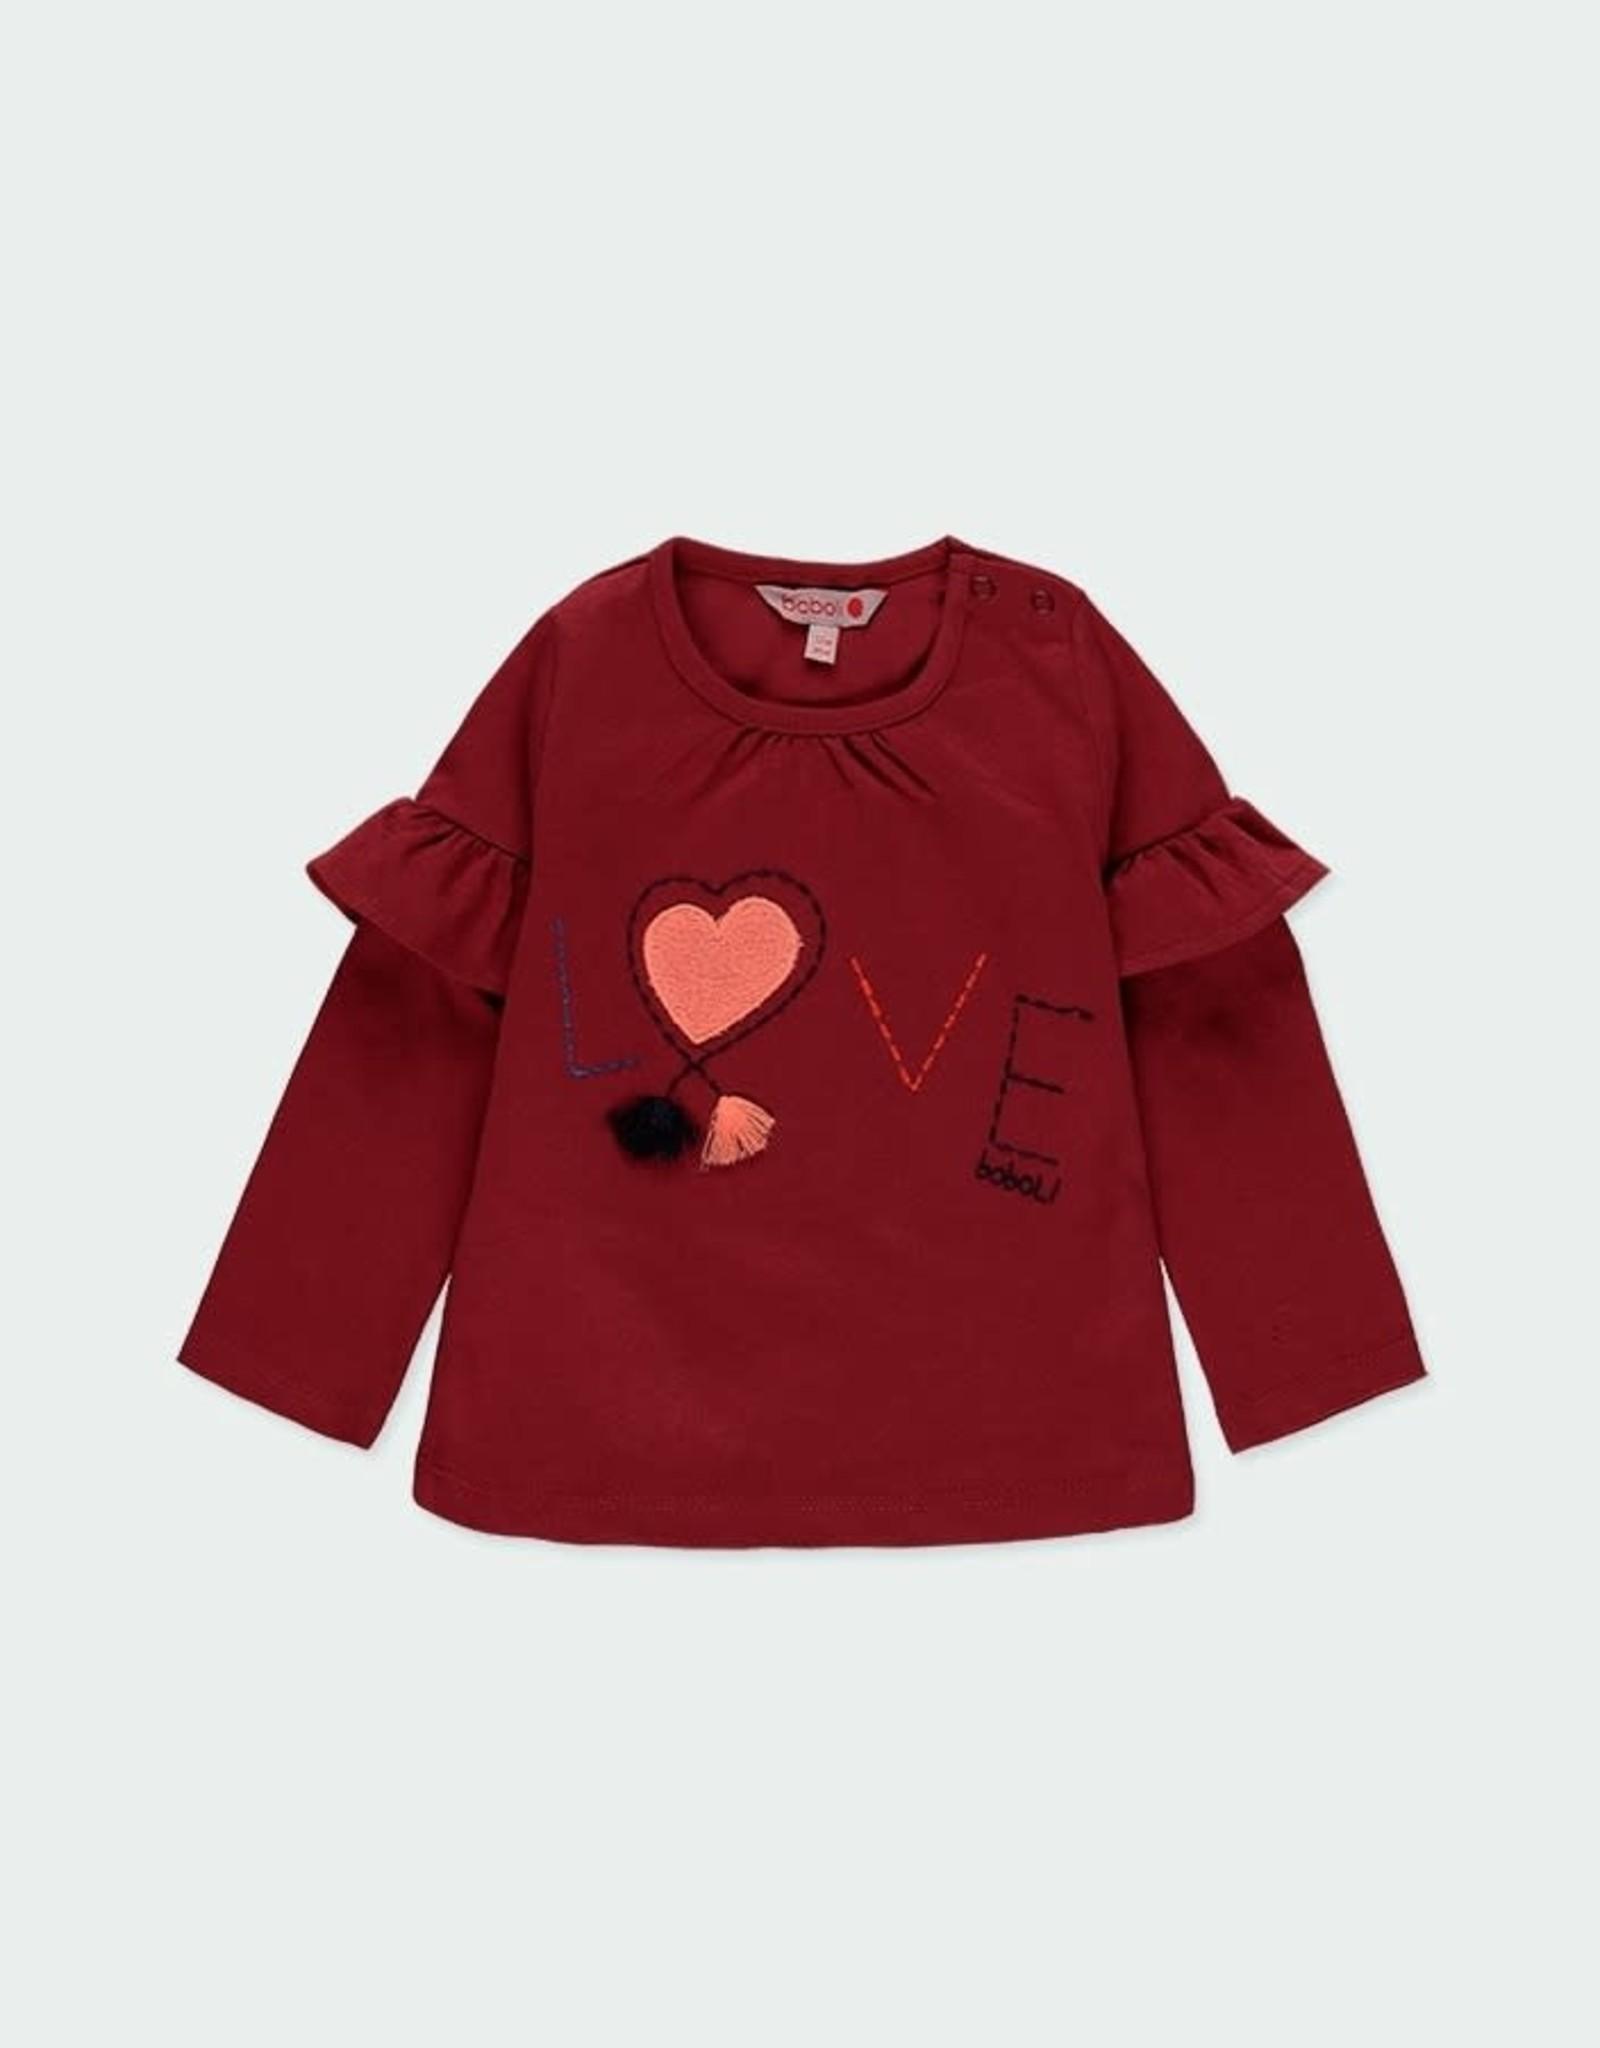 Boboli Ruffled Sleeve Shirt - Love